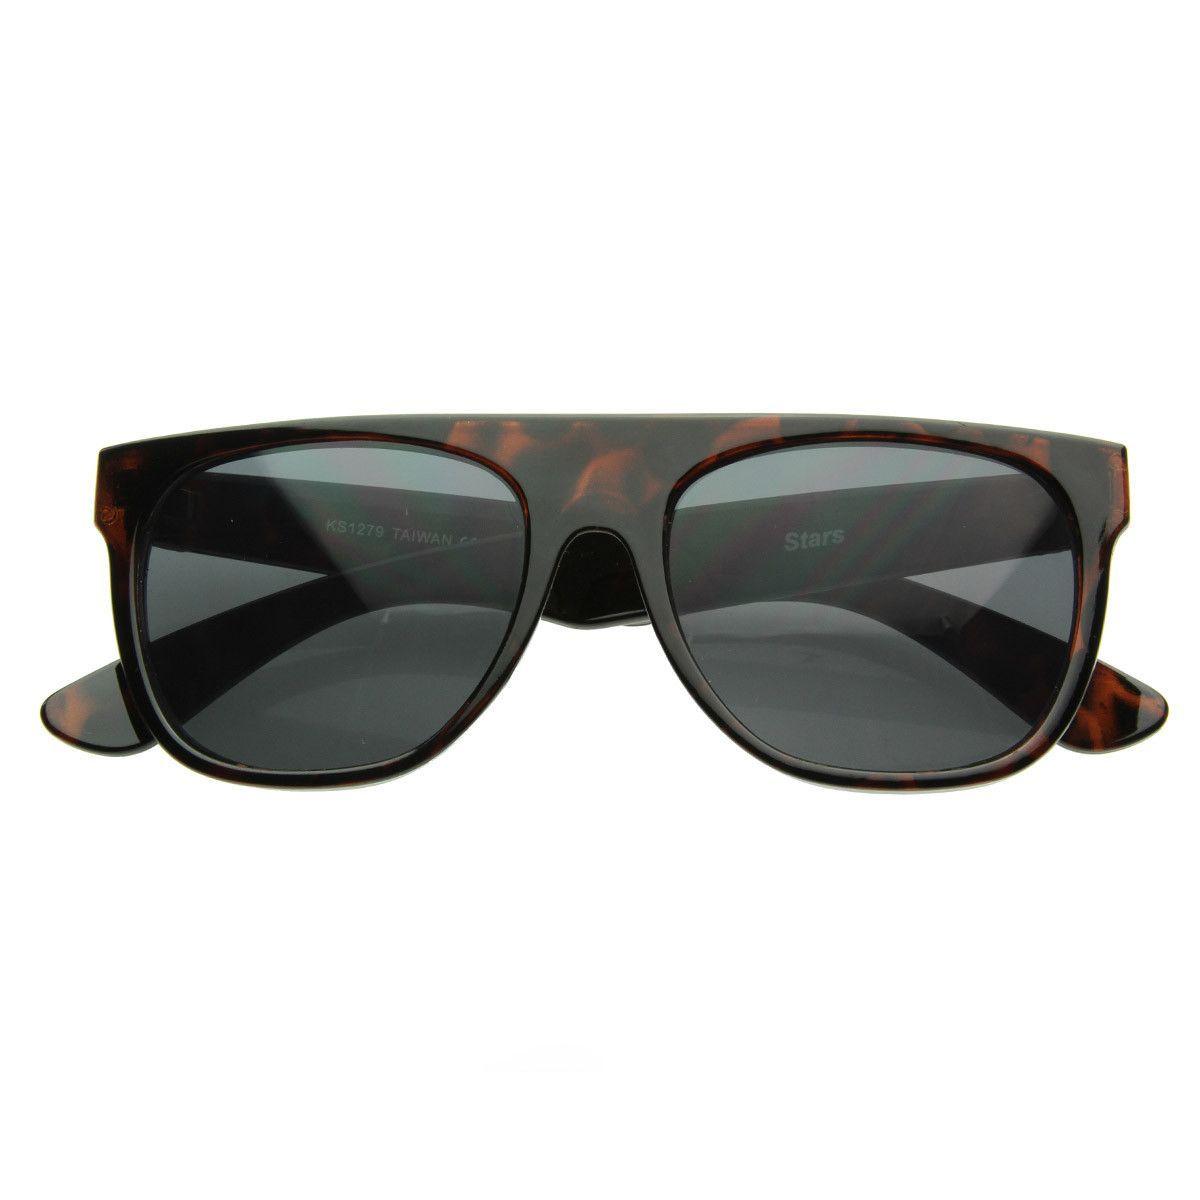 98cb28b194 Womens Hollywood Celebrity Kim Kardashian Flat Top Aviator Square Sunglasses  8685